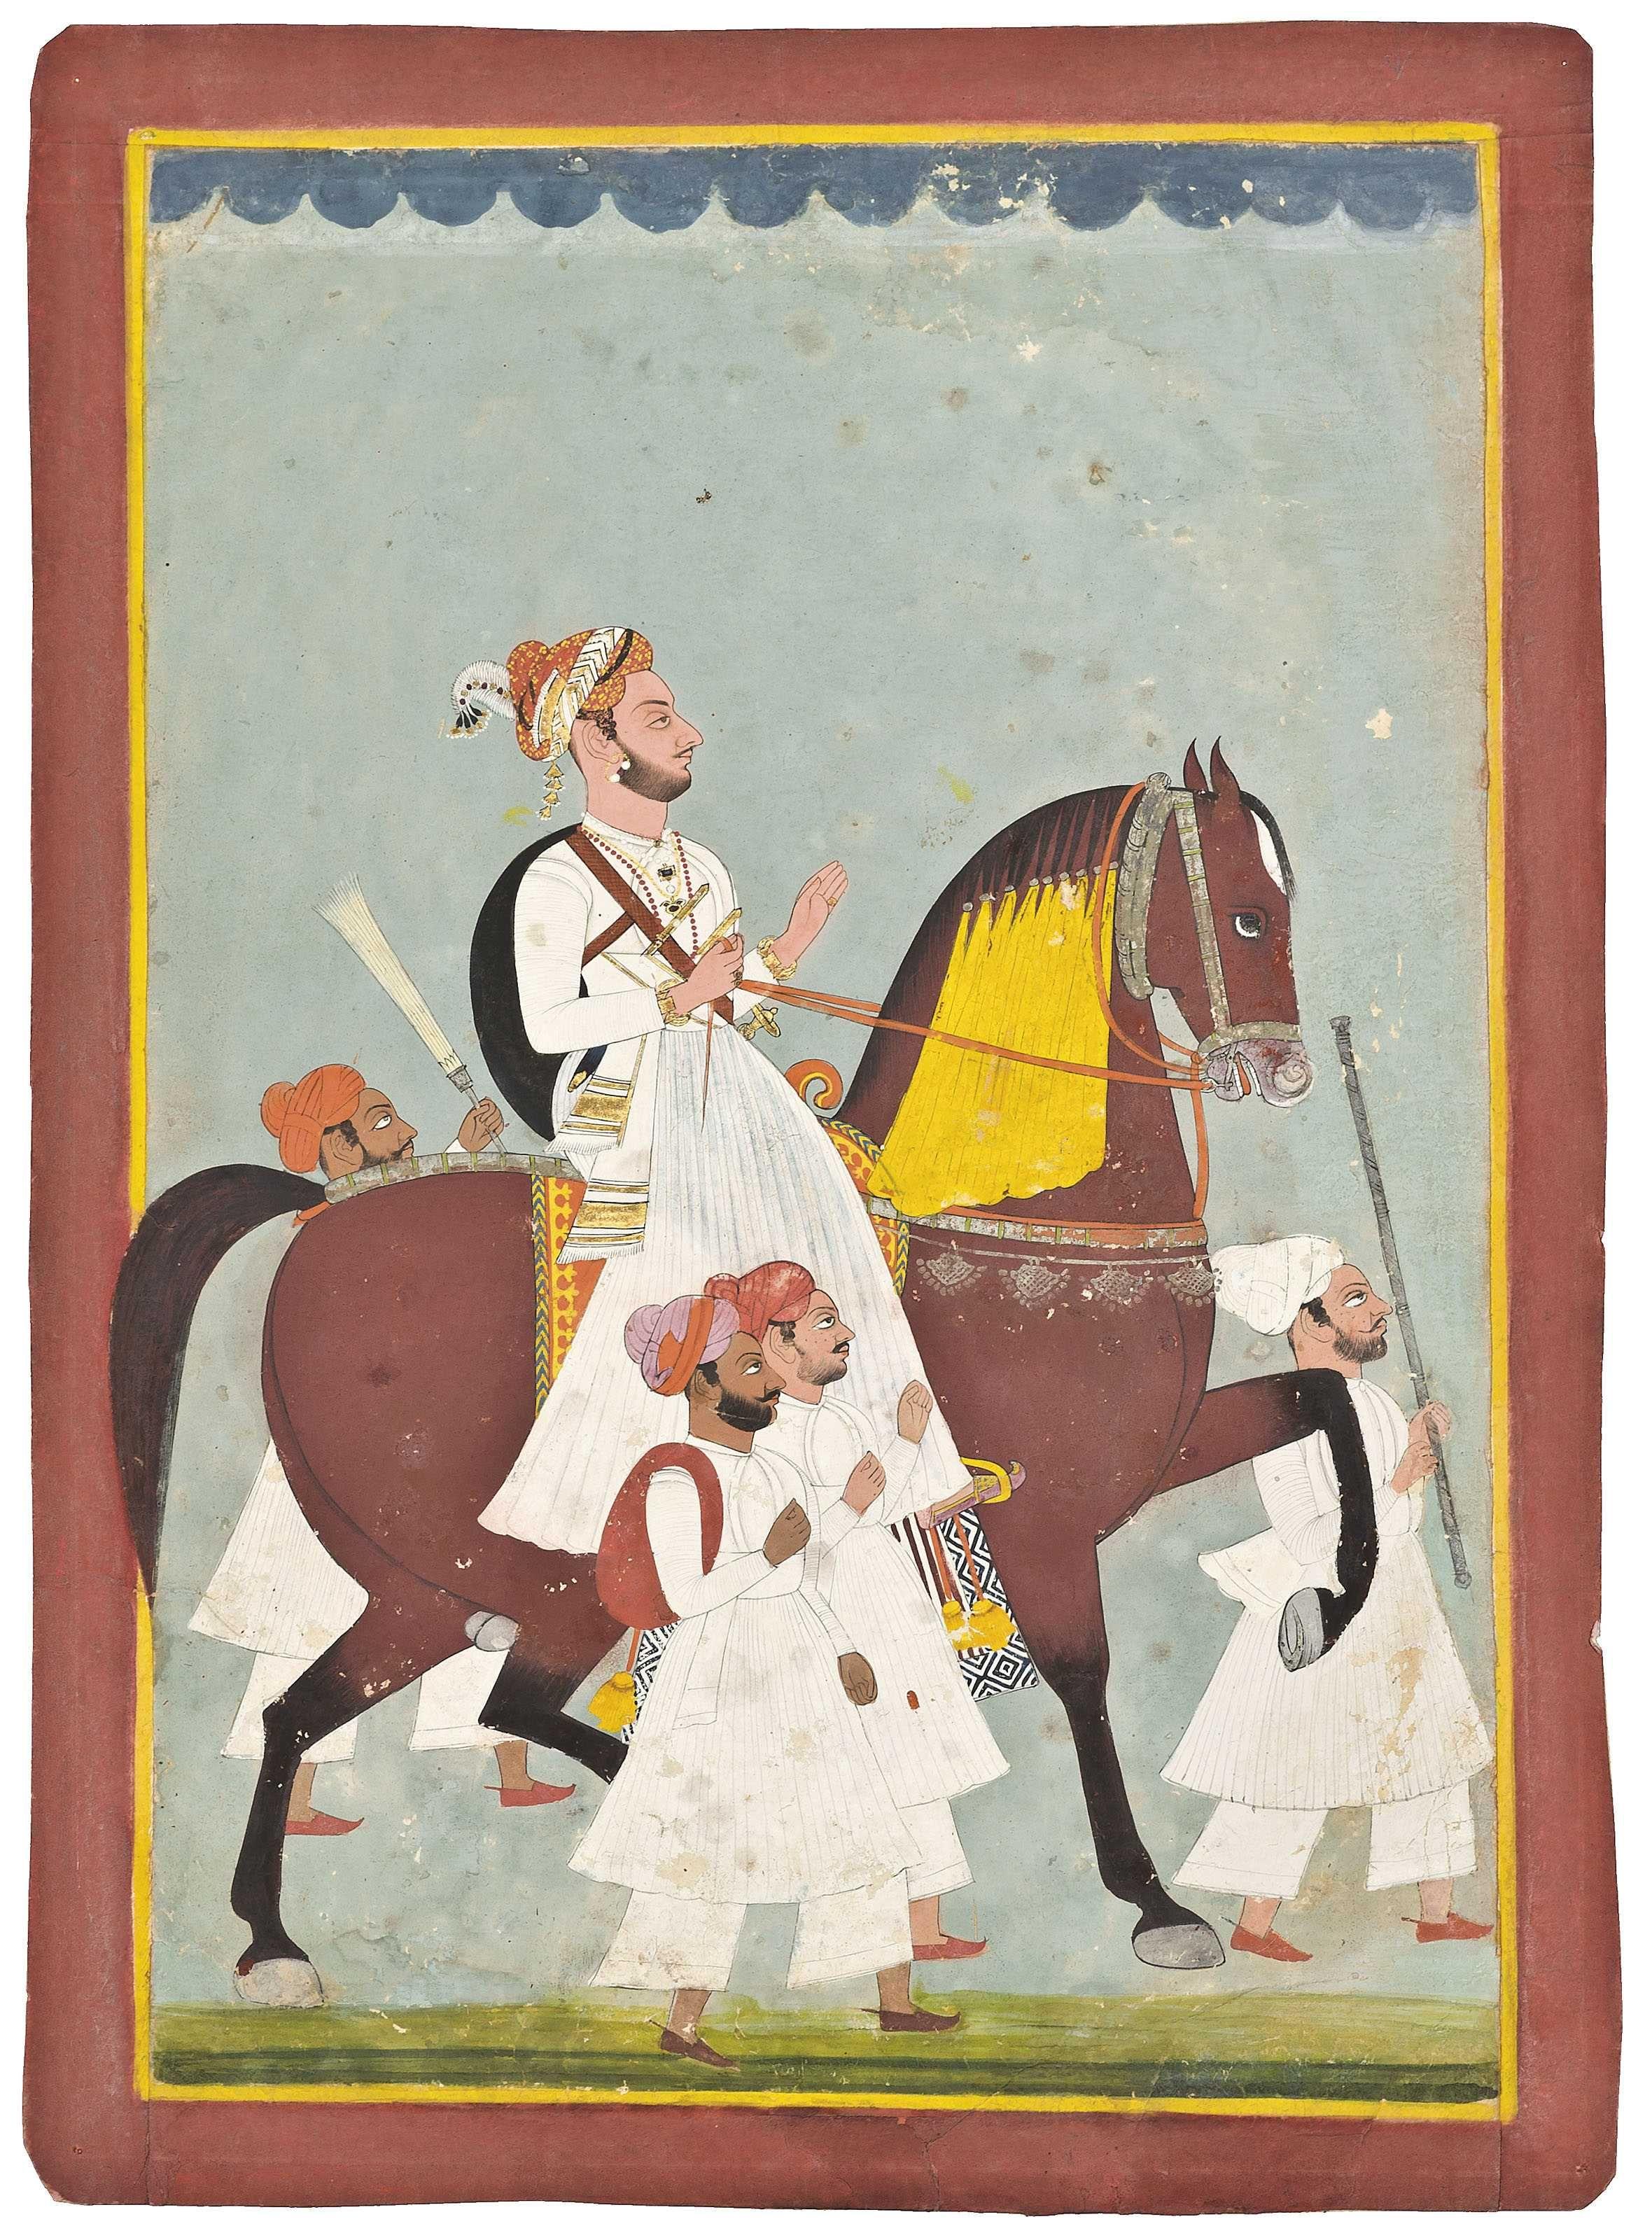 A large equestrian portrait of a rajput ruler indian art